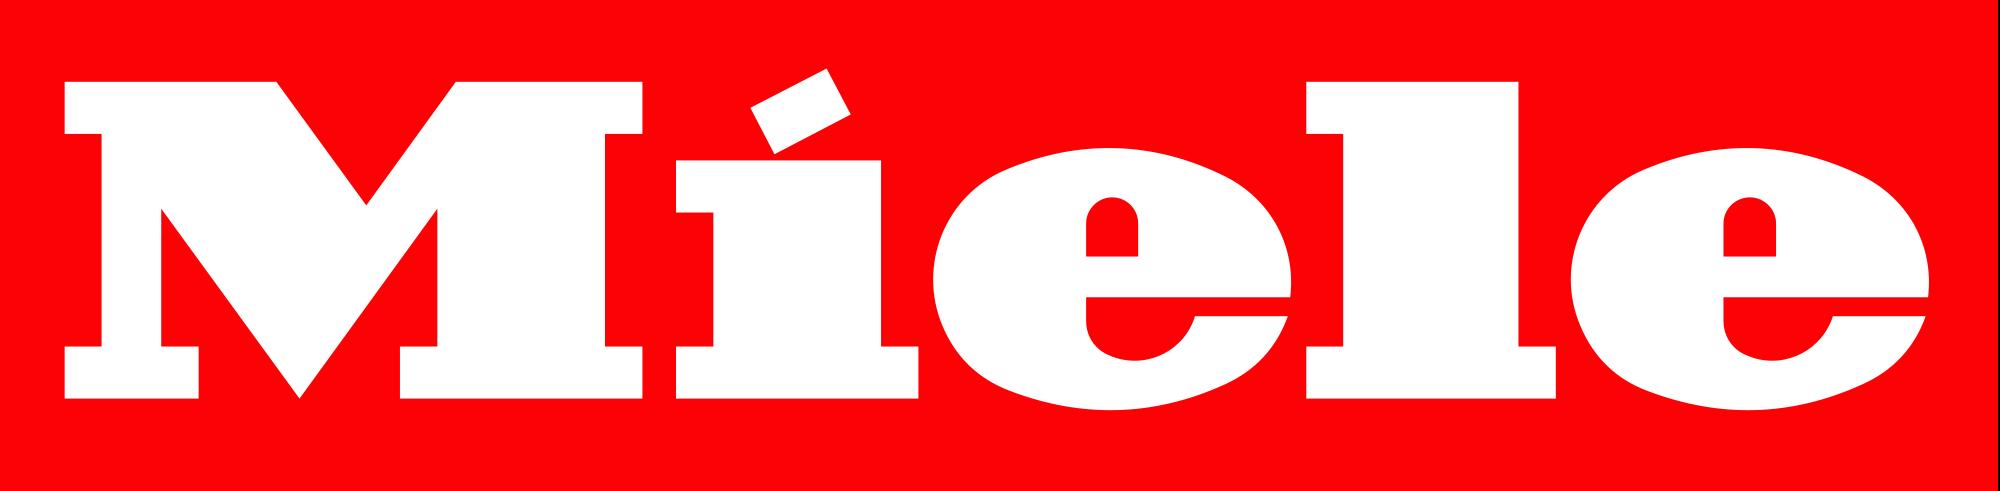 Miele logo.png